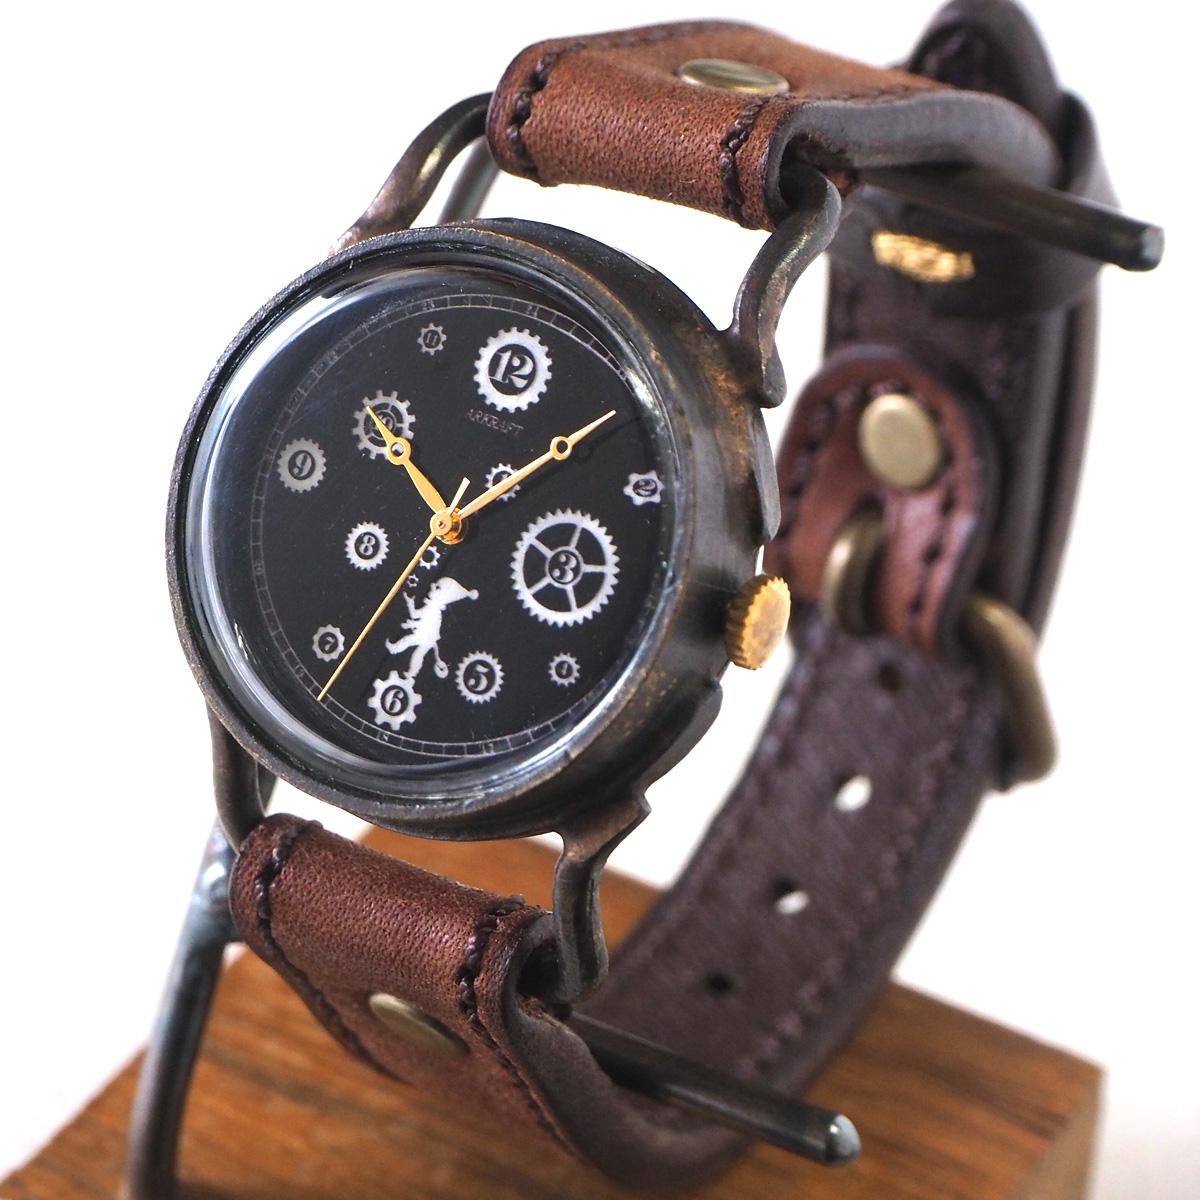 "ARKRAFT(アークラフト)手作り腕時計""Pivo Medium"" 黒文字盤 プレミアムストラップ [AR-C-018-BK] 時計作家 新木秀和 ハンドメイドウォッチ ハンドメイド腕時計 手作り時計 本革ベルト シェル文字盤 歯車 真鍮 クオーツ アナログ 日本製 国産"